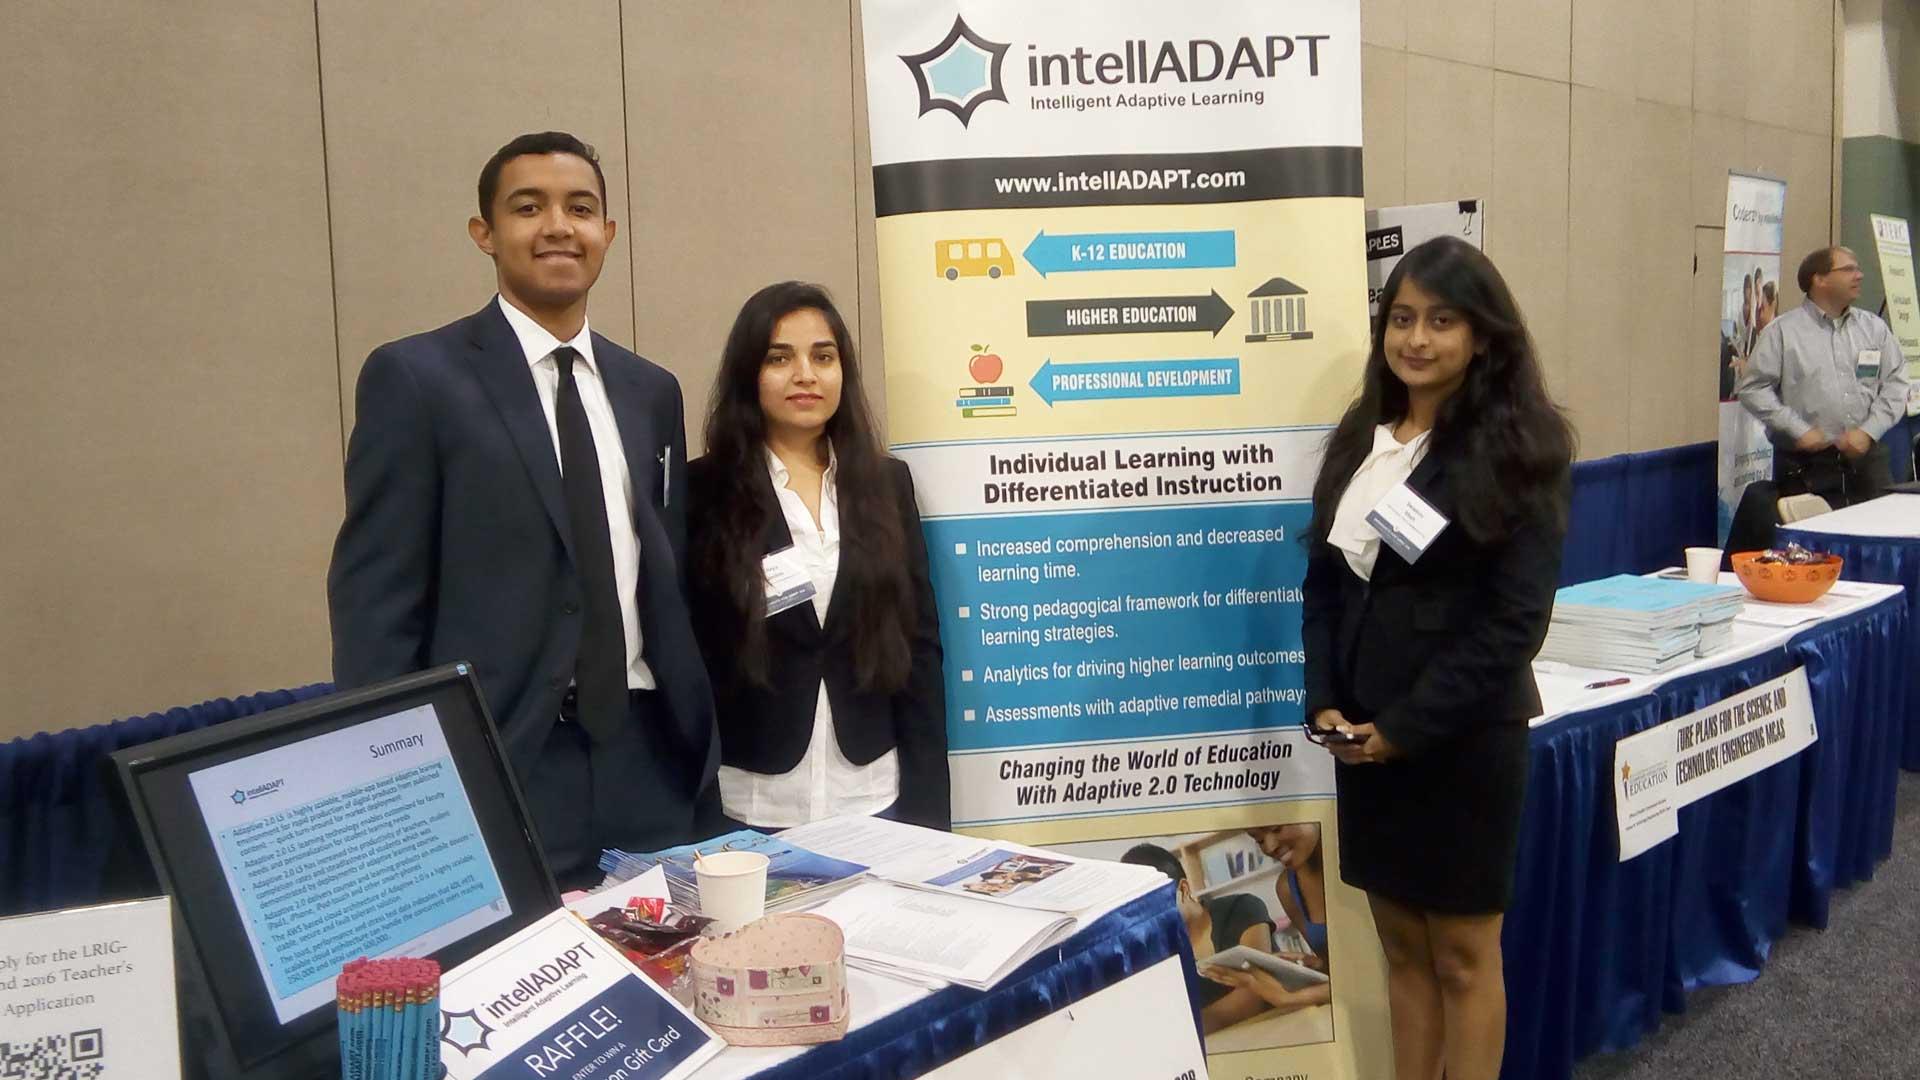 IntellADAPT team presenting adaptive learning solutions at the Exhibit Hall of Massachusetts STEM Summit 2016.